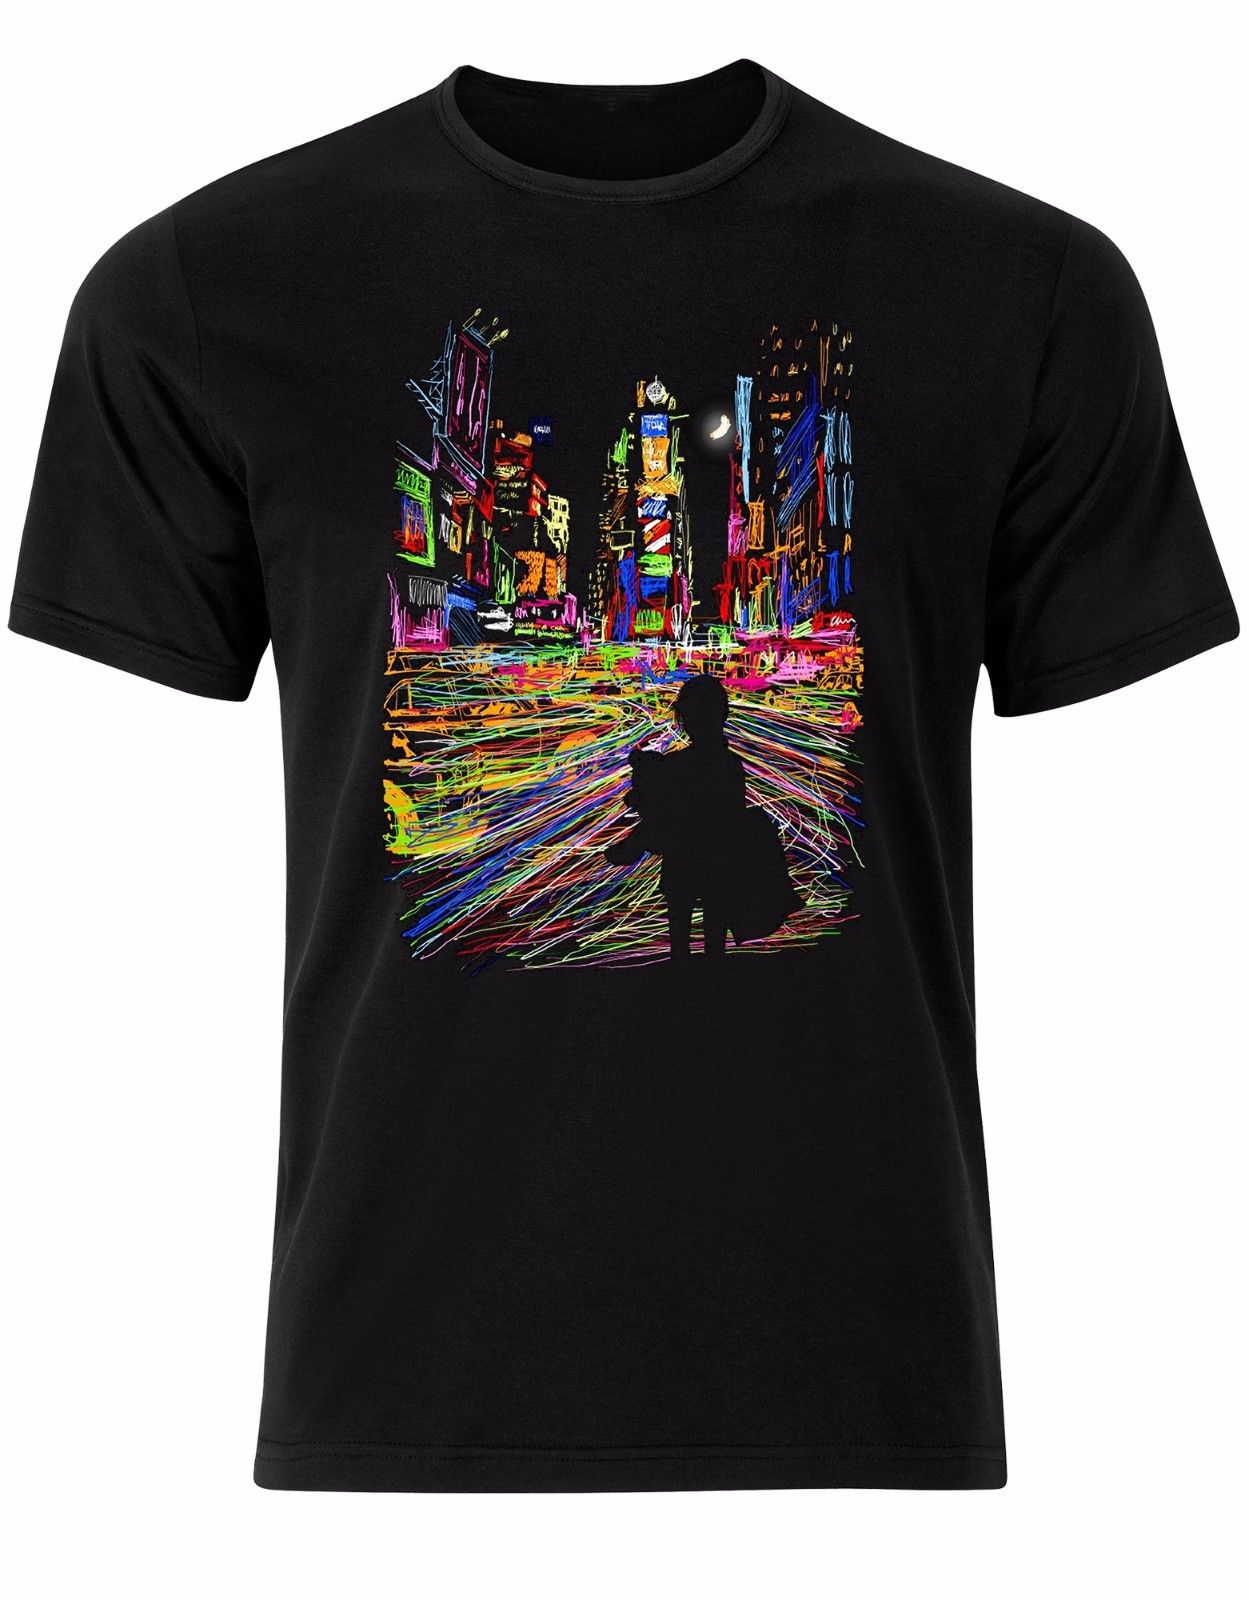 City Lights Moon Night Neon Colours Dreams Pillow Mens Tshirt Tee Top AL65 Short Sleeve T-Shirt Funny Print top tee